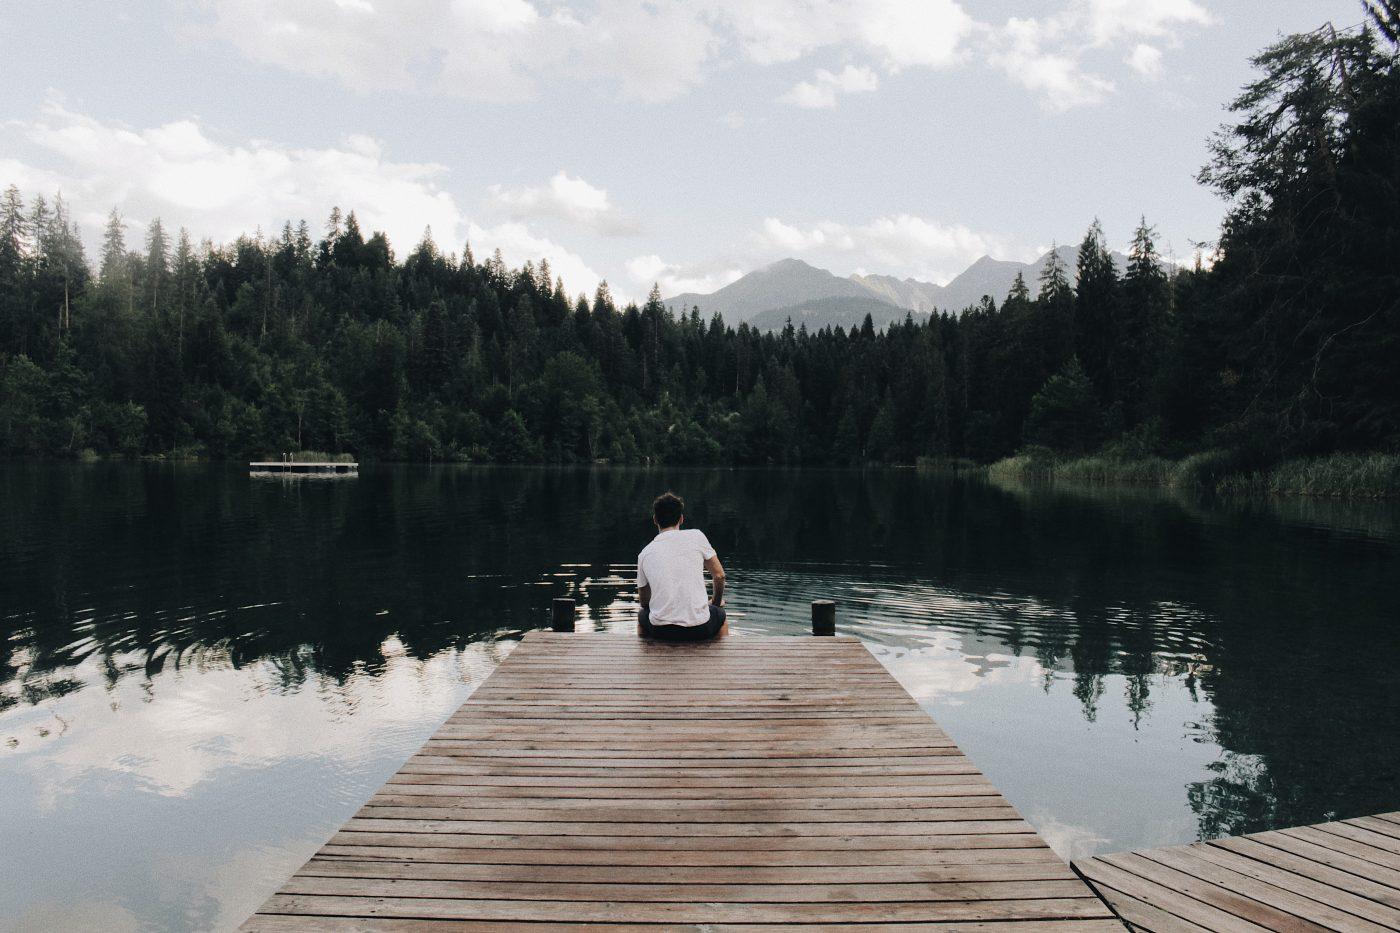 Minimalism: man sitting on dock